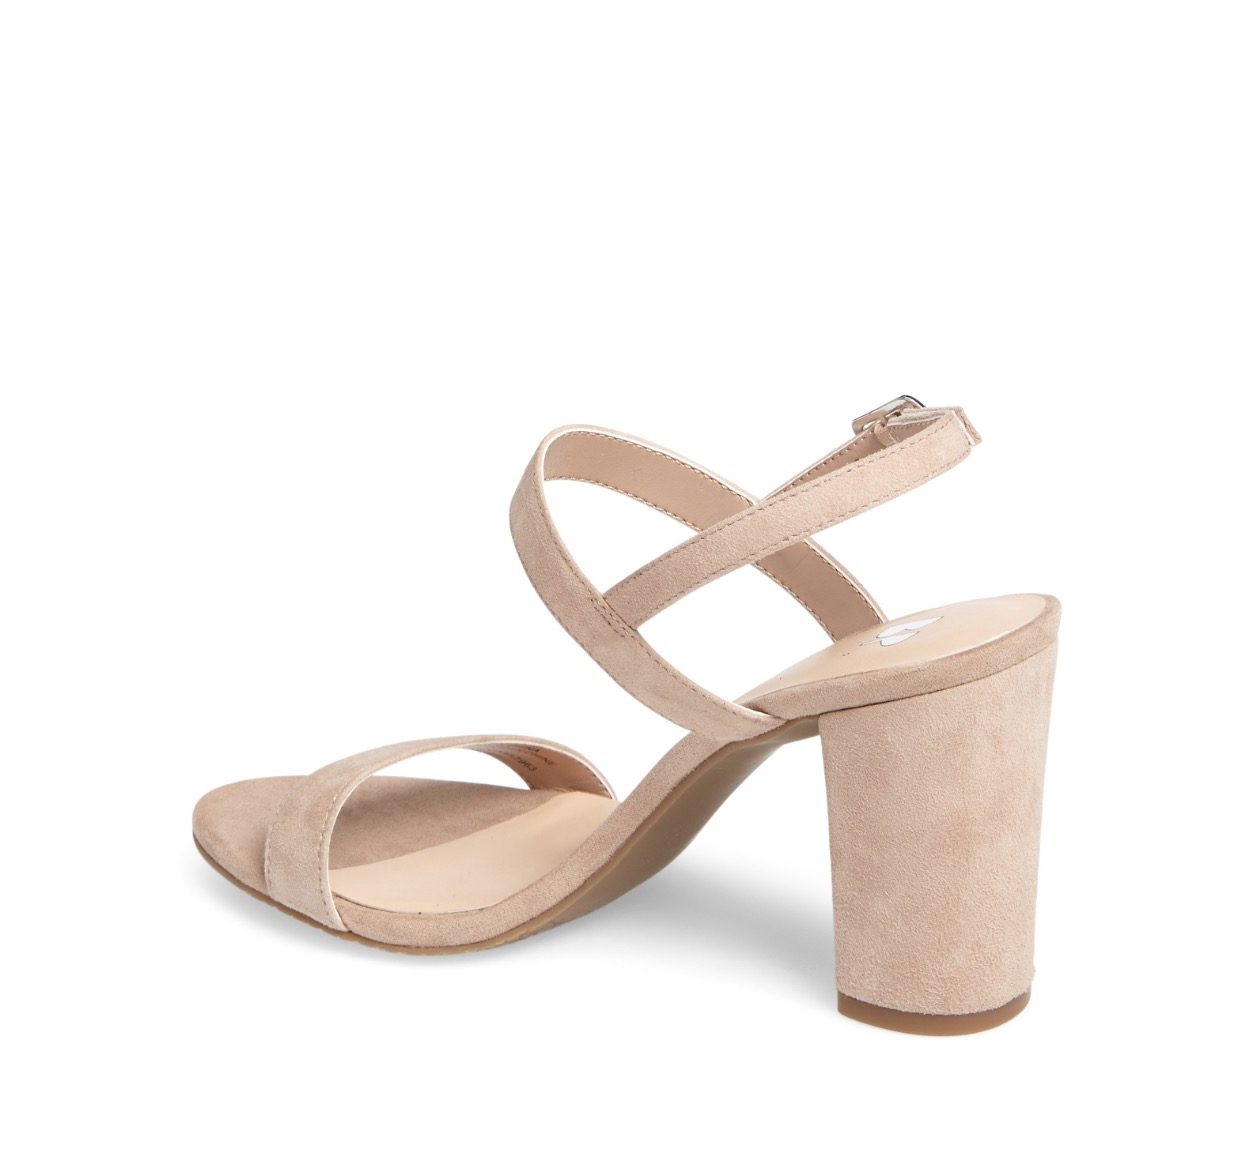 e0a2951795de Nordstrom  Lula Block Heel Slingback Sandal BP. - Elevated Style